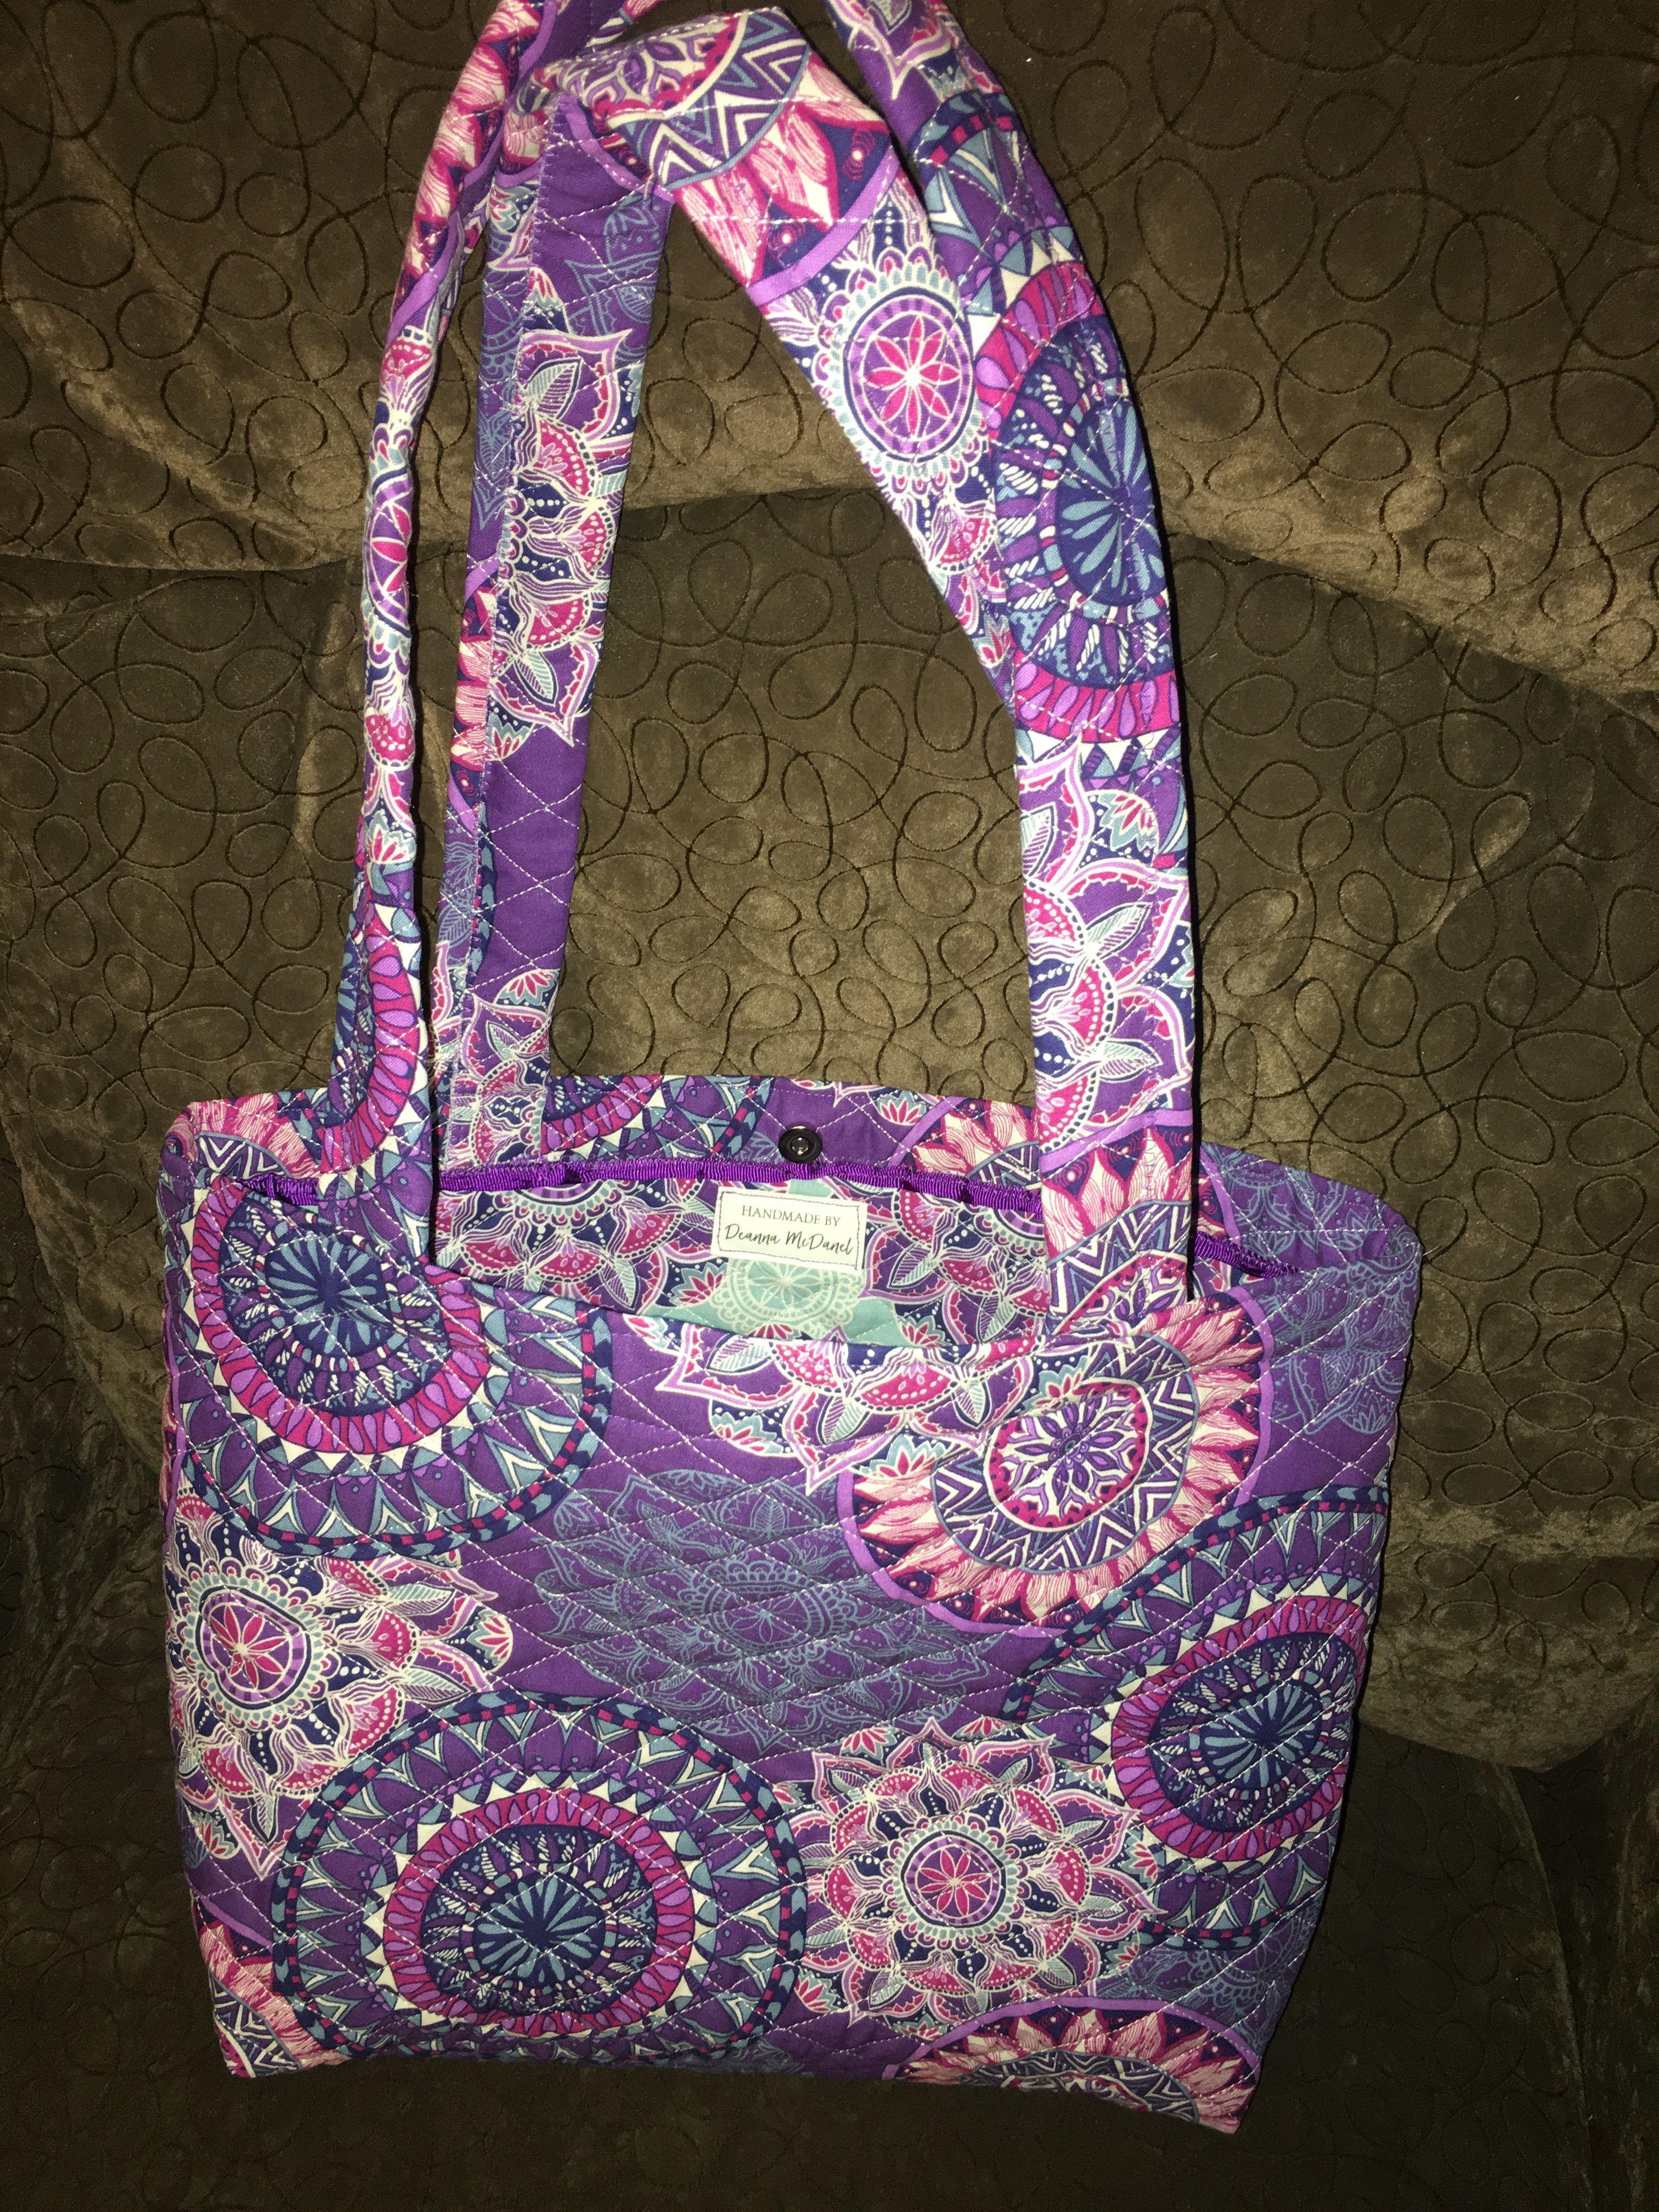 862e46ad0a Vera Bradley inspired purse  pursessimilartoverabradley